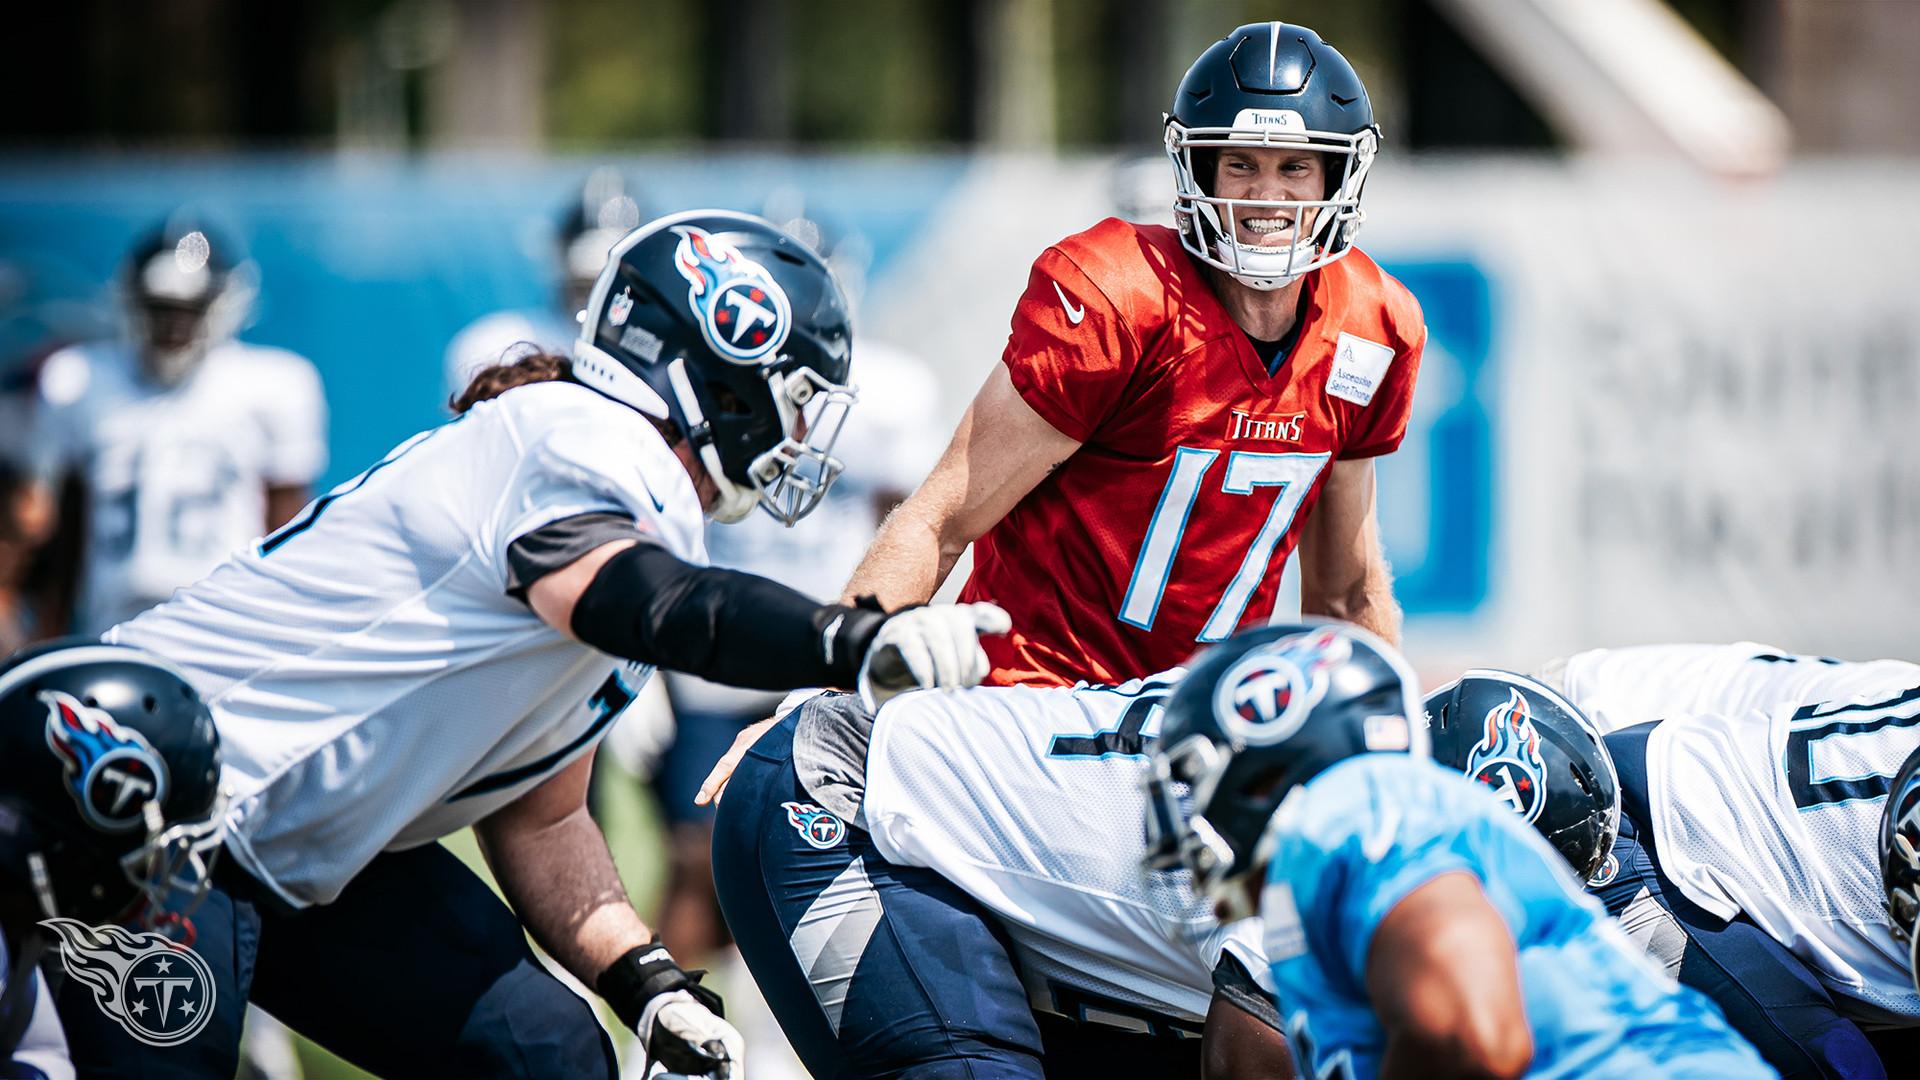 Titans ride hot streak into 2020, take South title